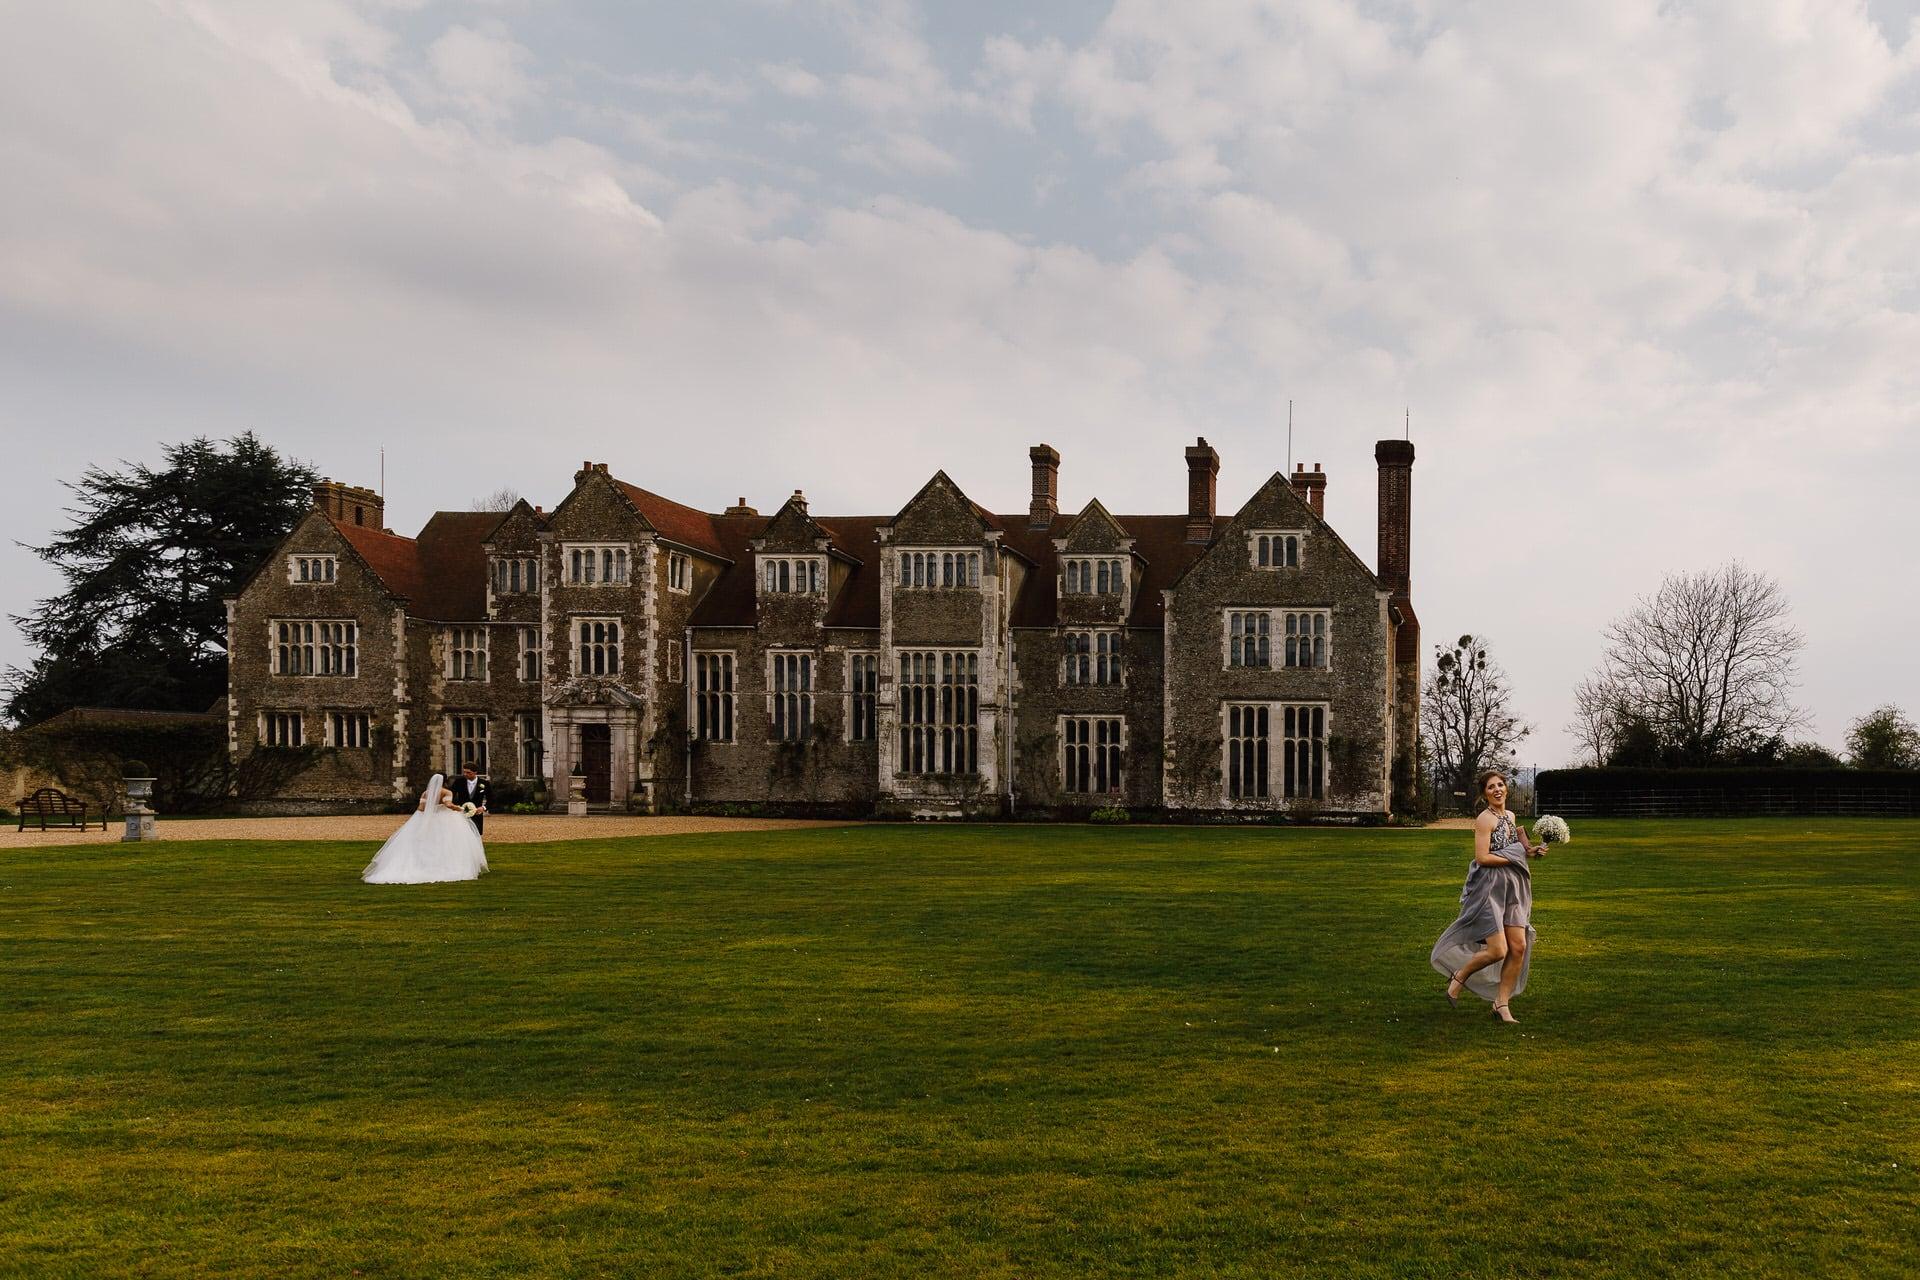 The Grandeur of Elizabethan Manor House at Loseley Park Surrey